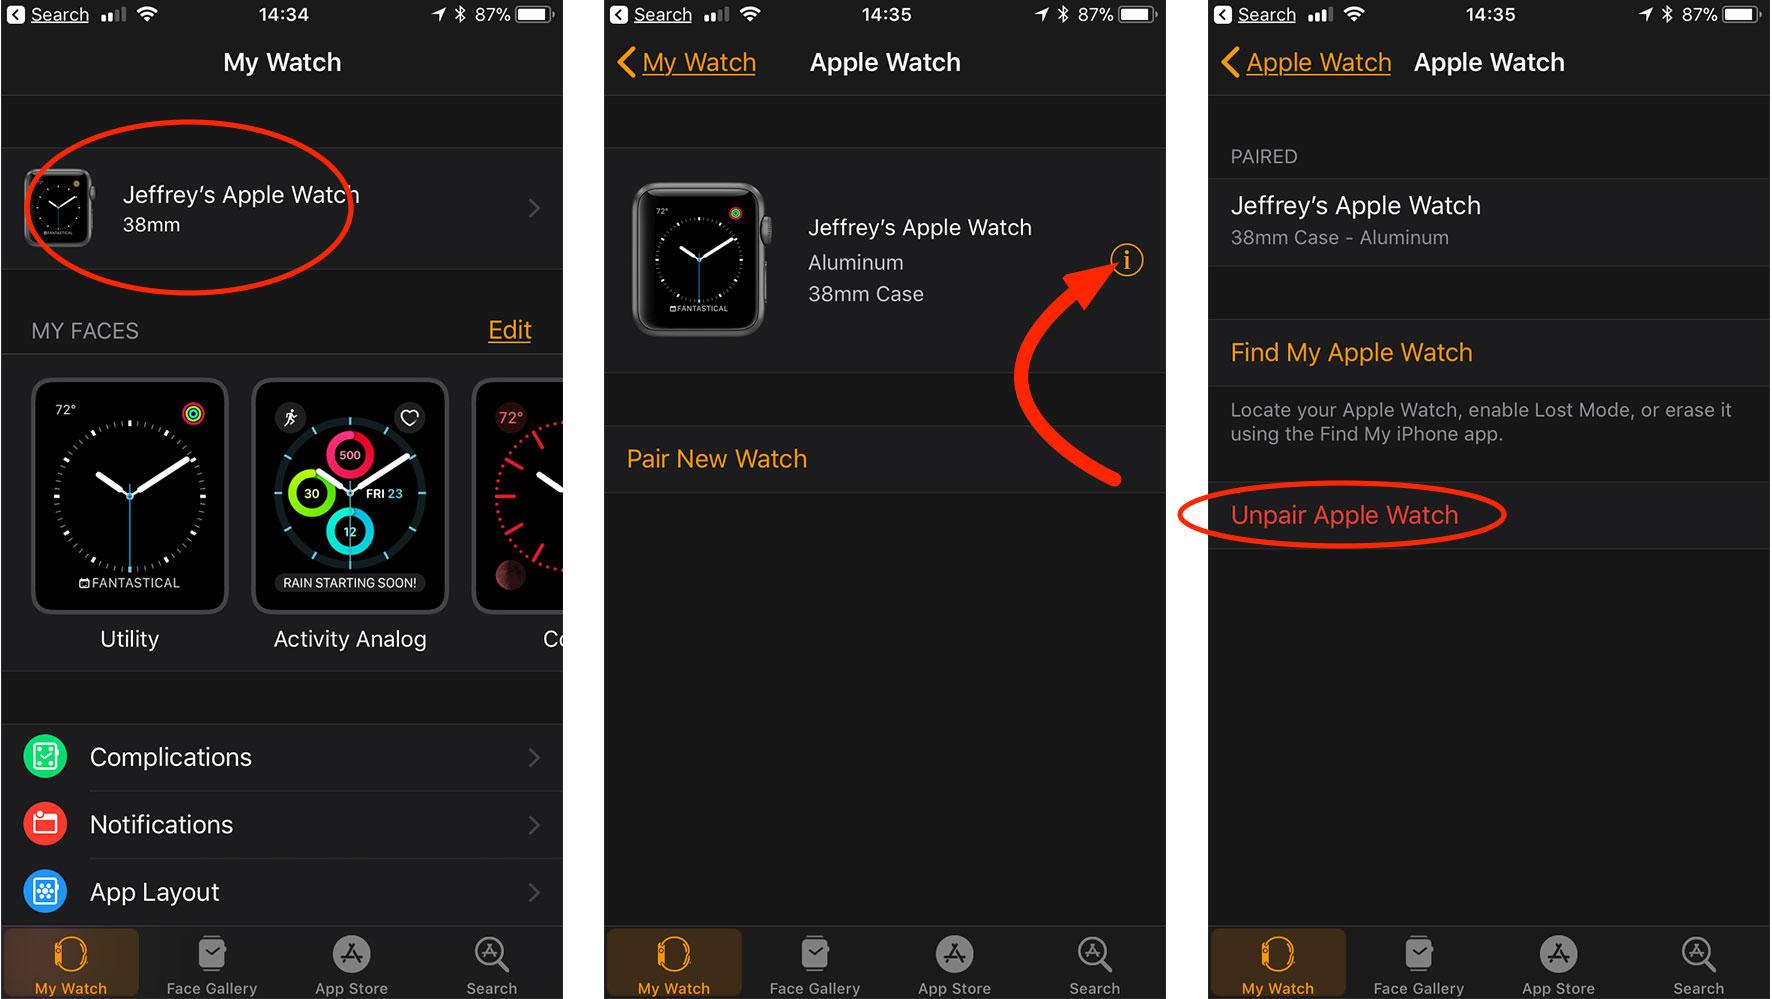 Apple Watch unpairing process on iPhone